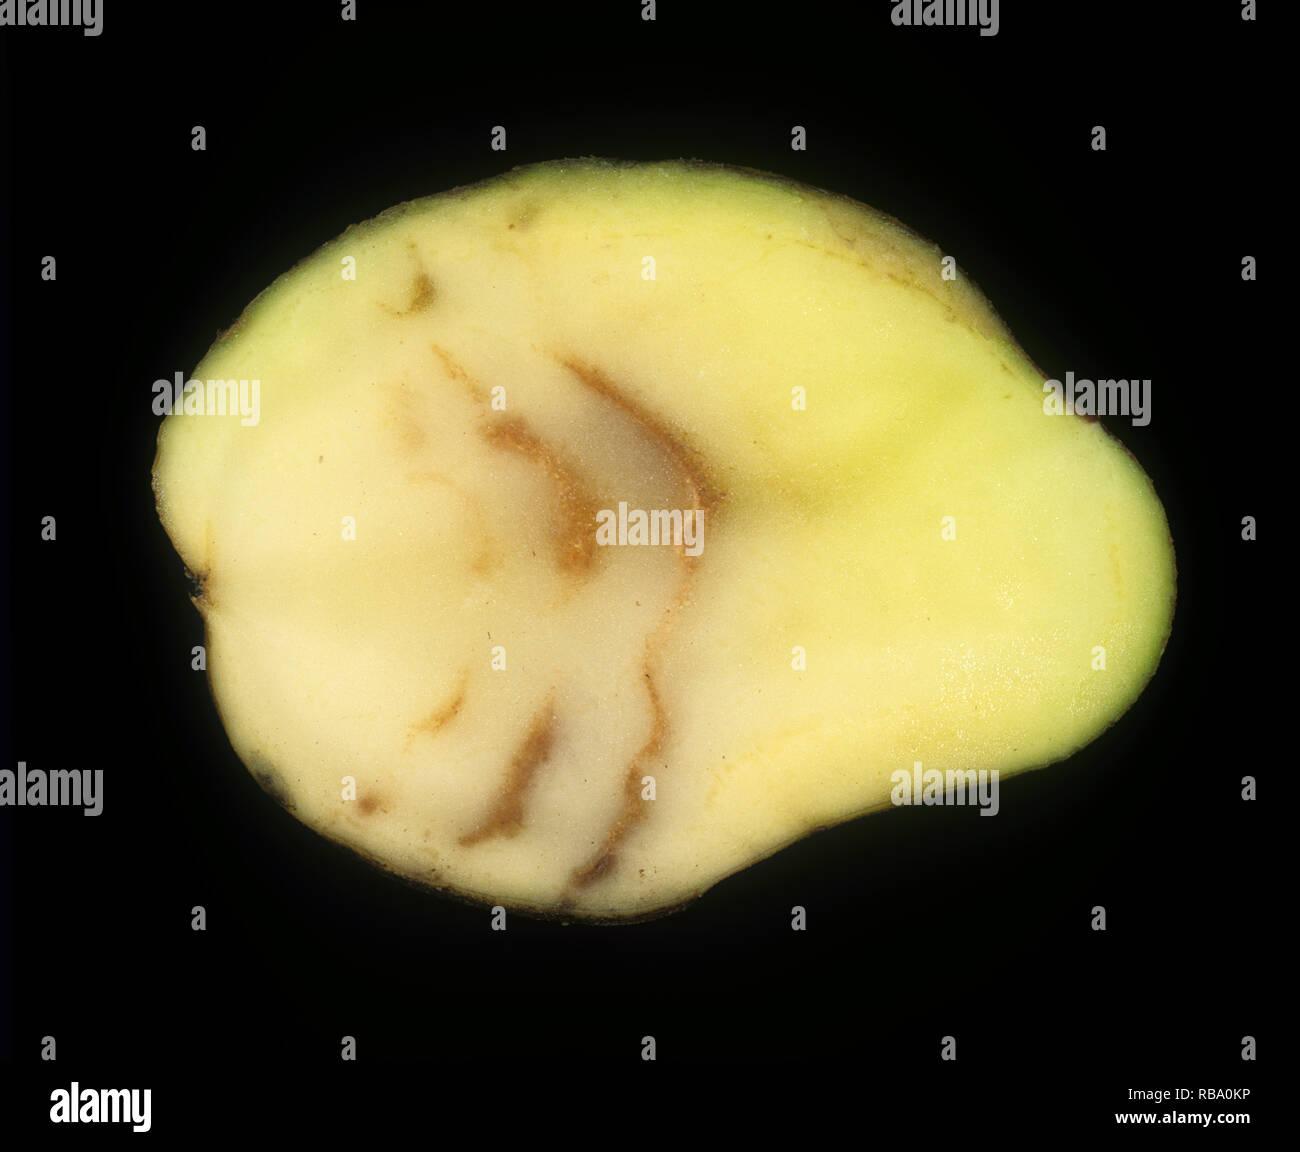 Spraing symptom of potato mop top virus (PMTV) in potato tuber section - Stock Image